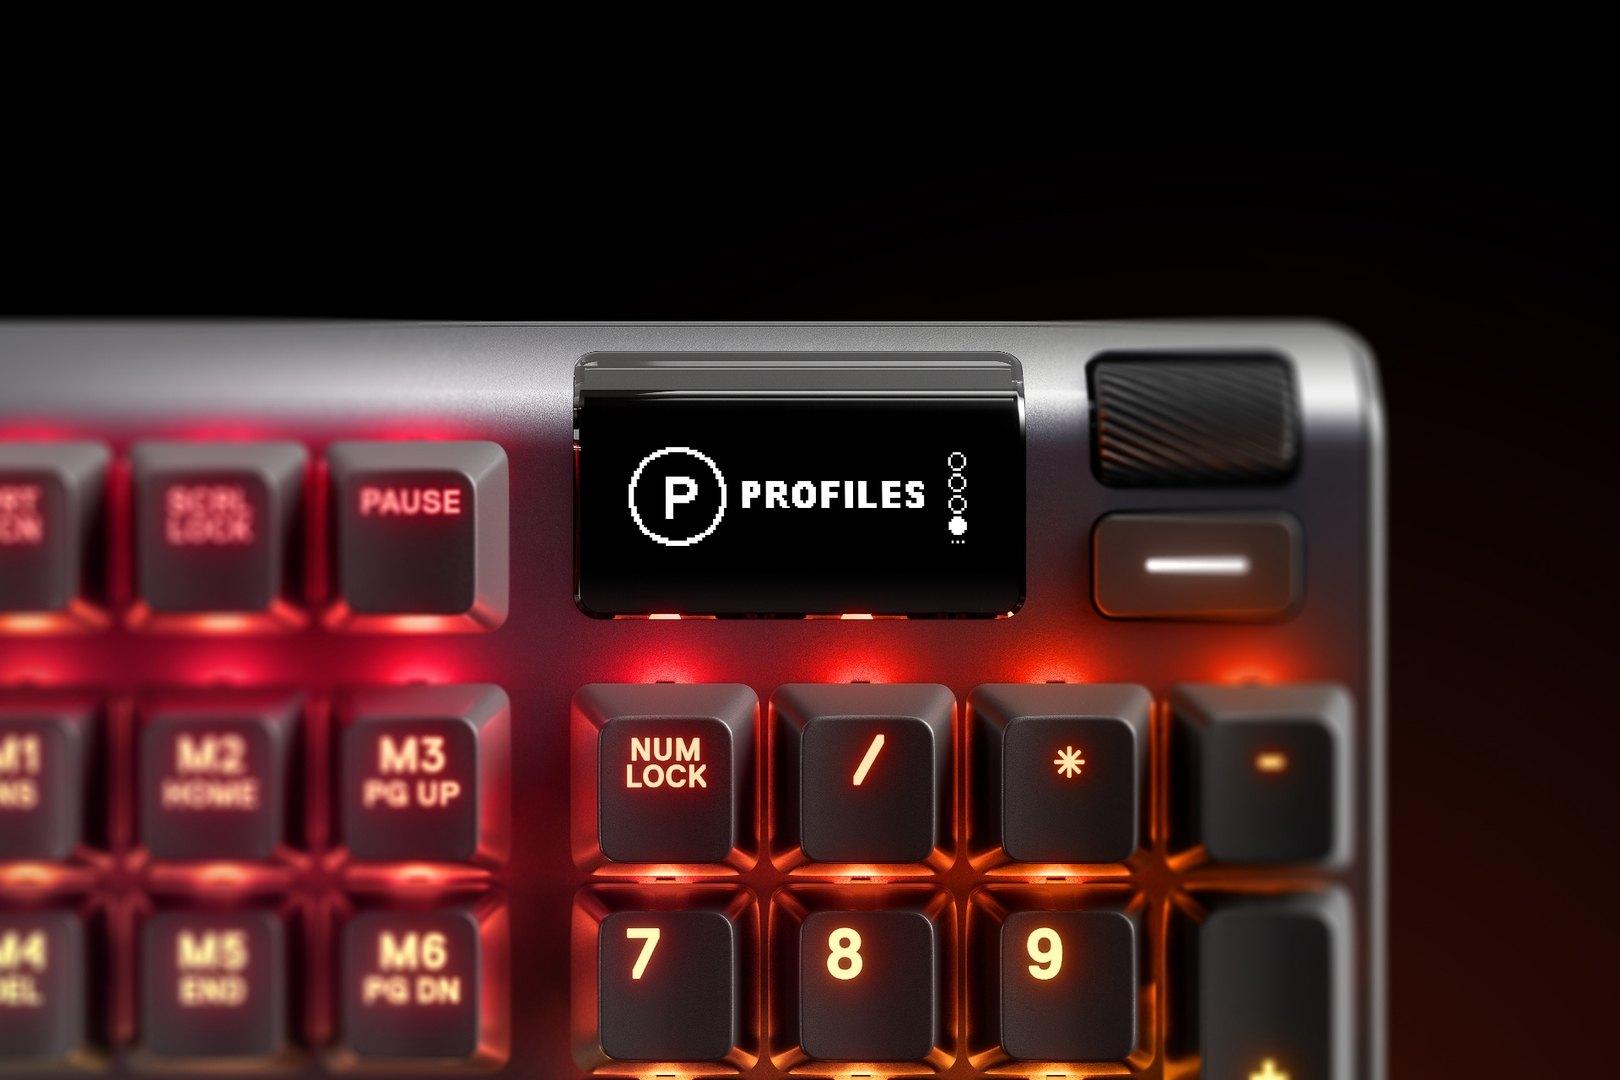 yeni-prismcaps-ile-tarzini-yansit-farkini-goster-2